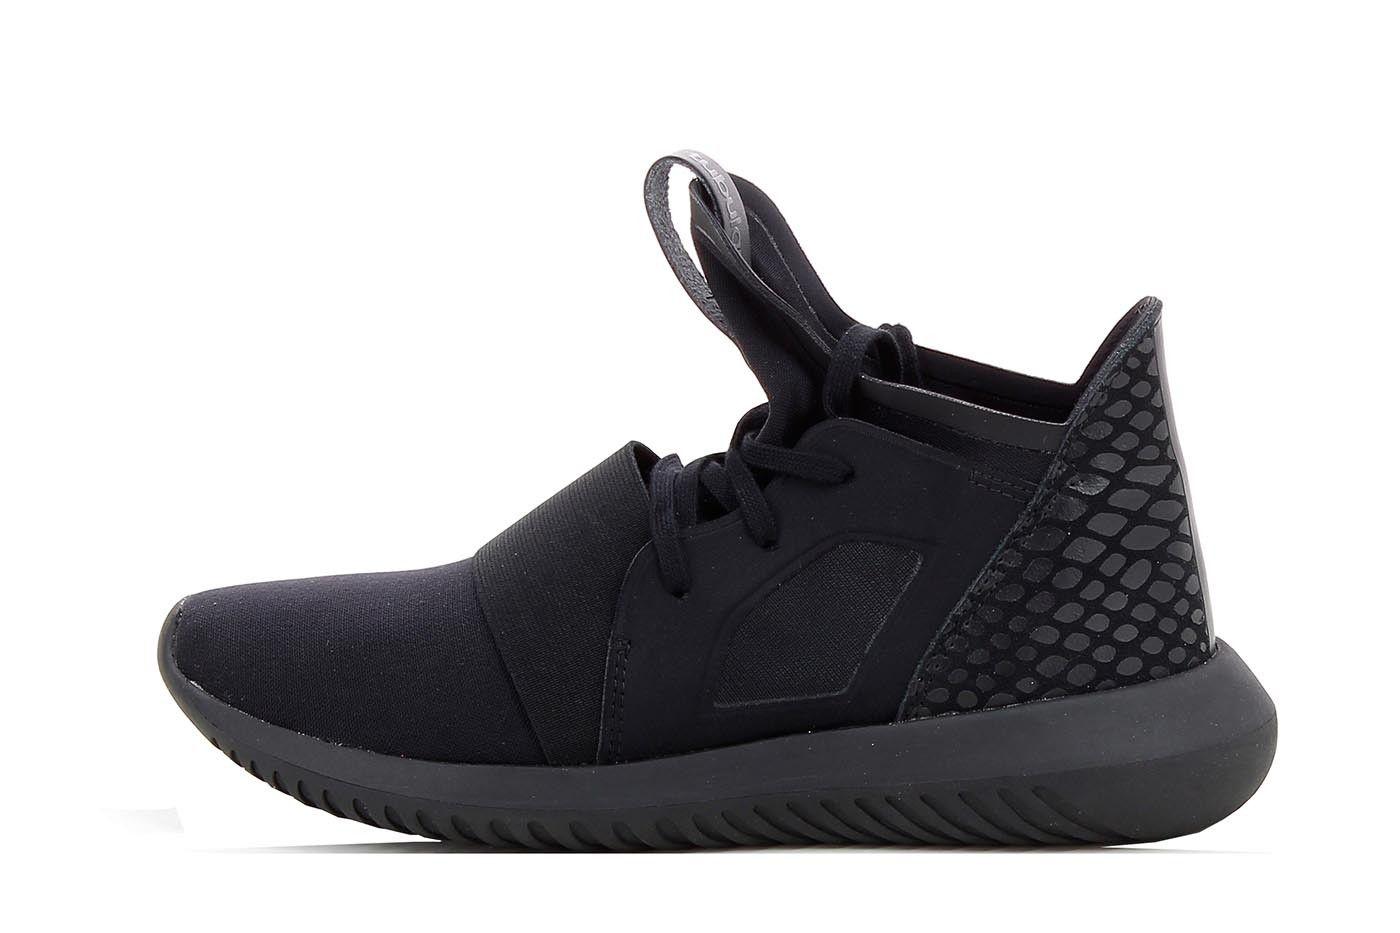 online retailer 31ff5 db17d Basket adidas Originals Tubular Defiant - S75244 - Pegashoes